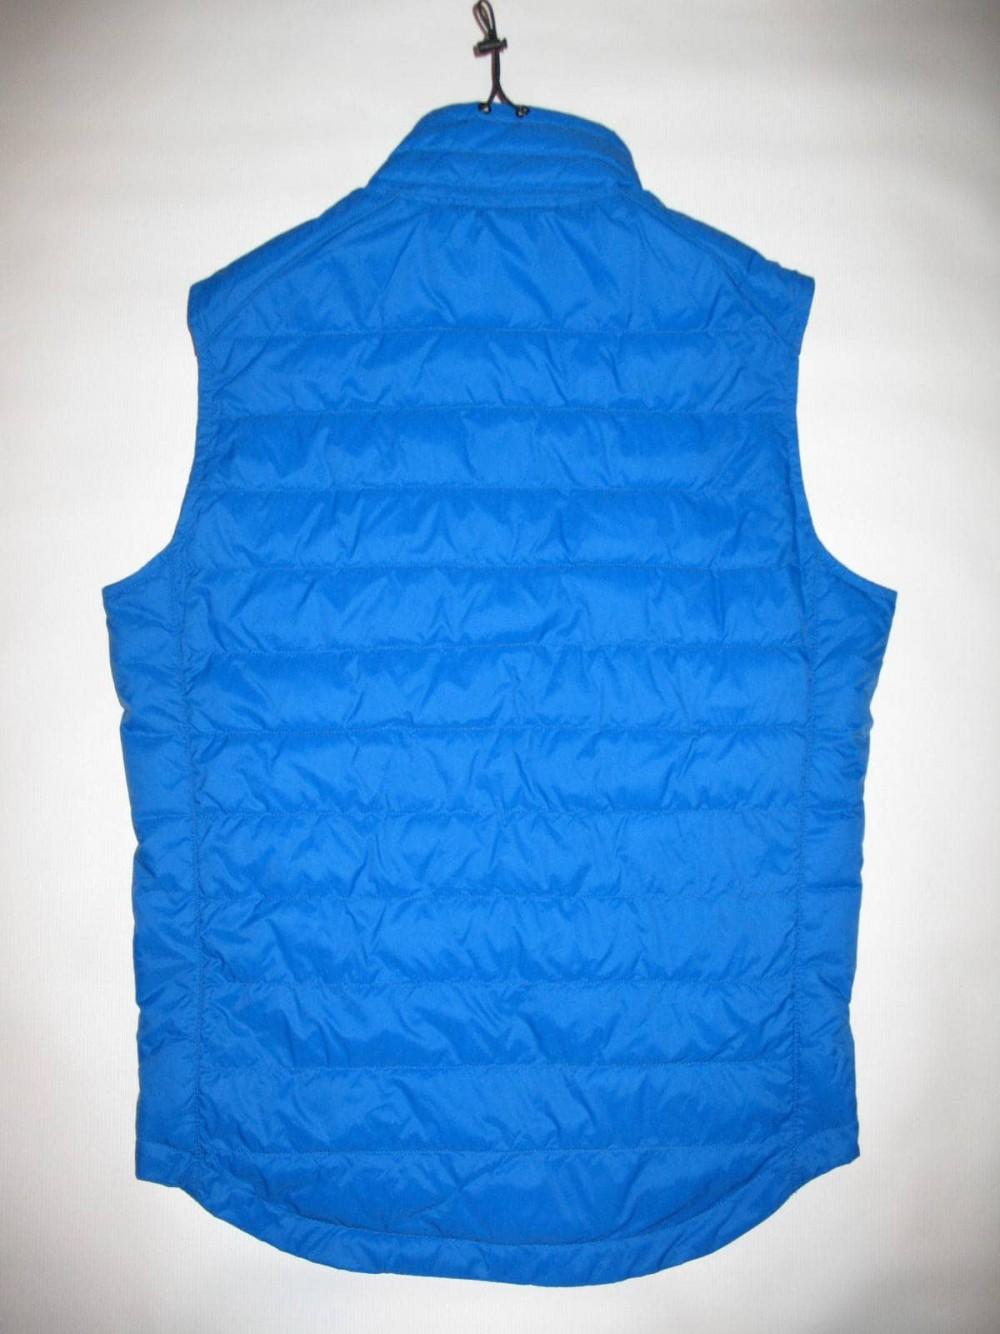 Жилет BANANA REPUBLIC primaloft vest (размер S) - 1